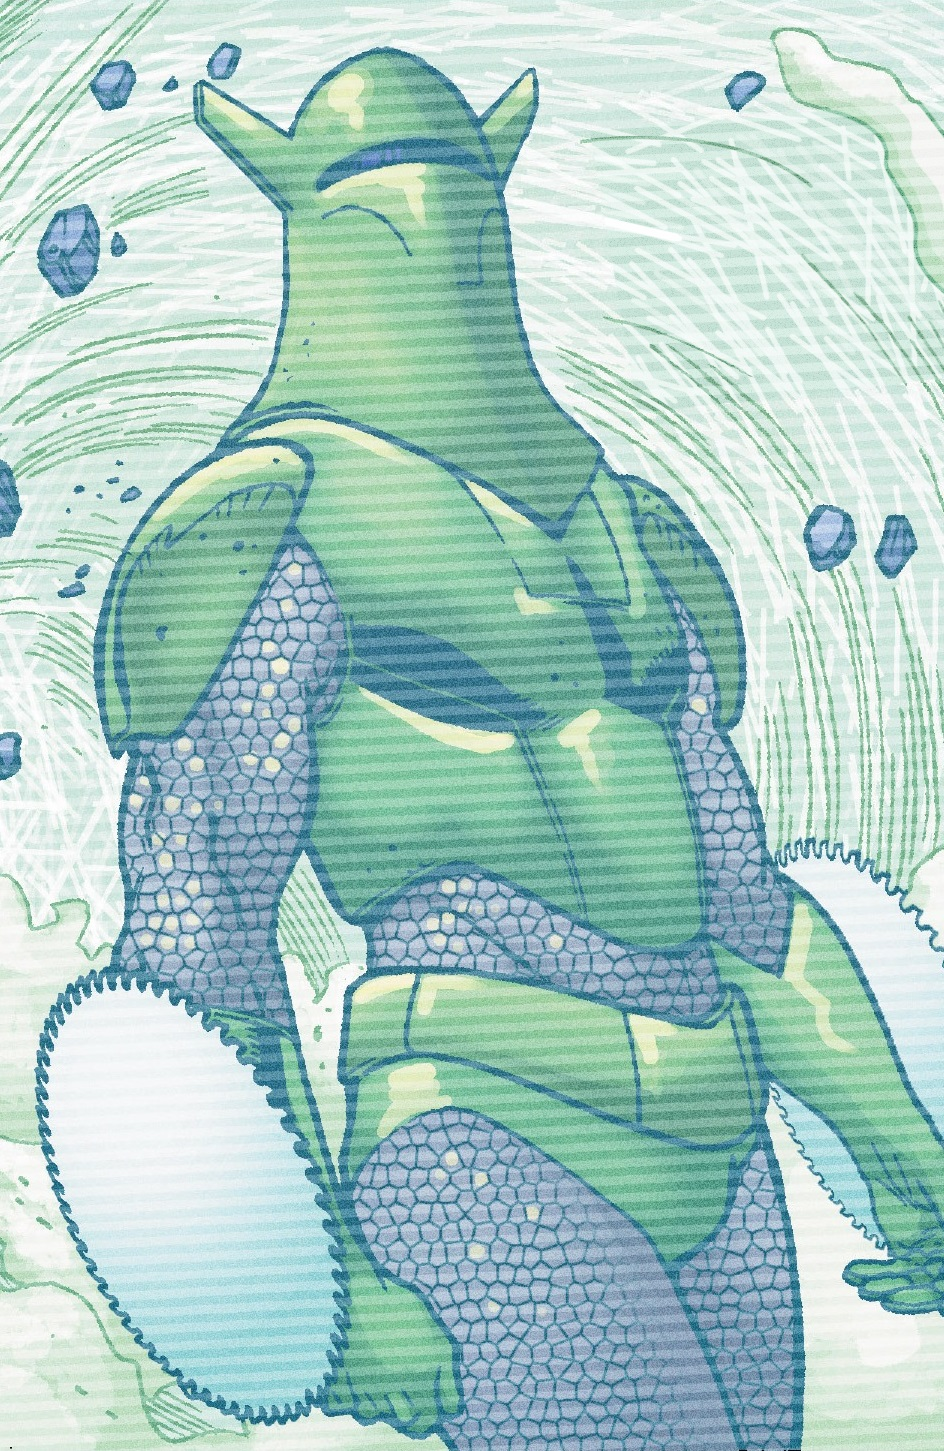 David Cannon (Earth-616)